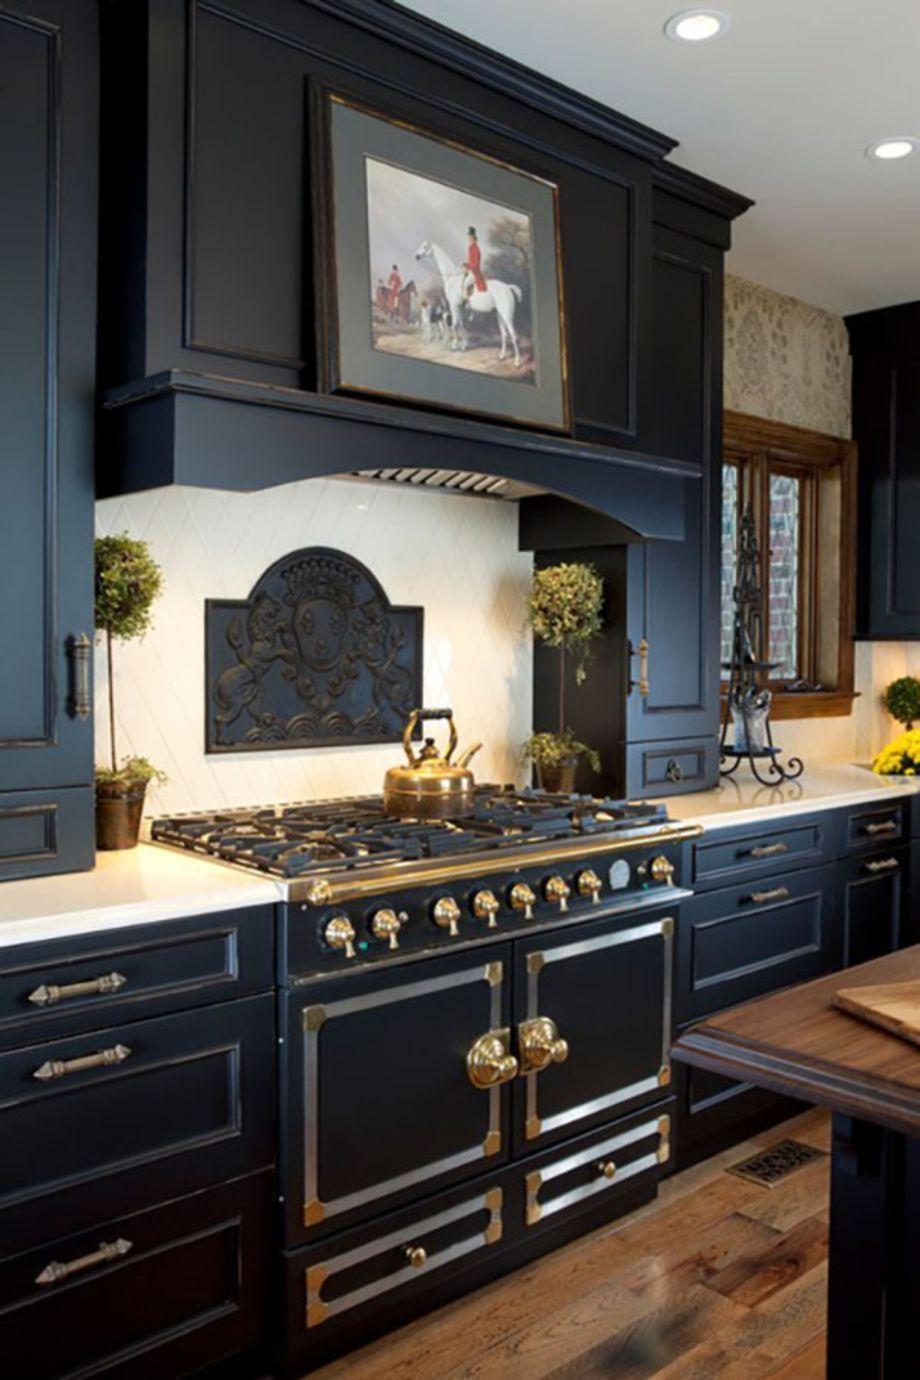 Cool Contact Paper Kitchen Cabinet Doors Ideas To Makes Look Expensive 33 Interior Design Kitchen Parisian Decor Chic Interior Design